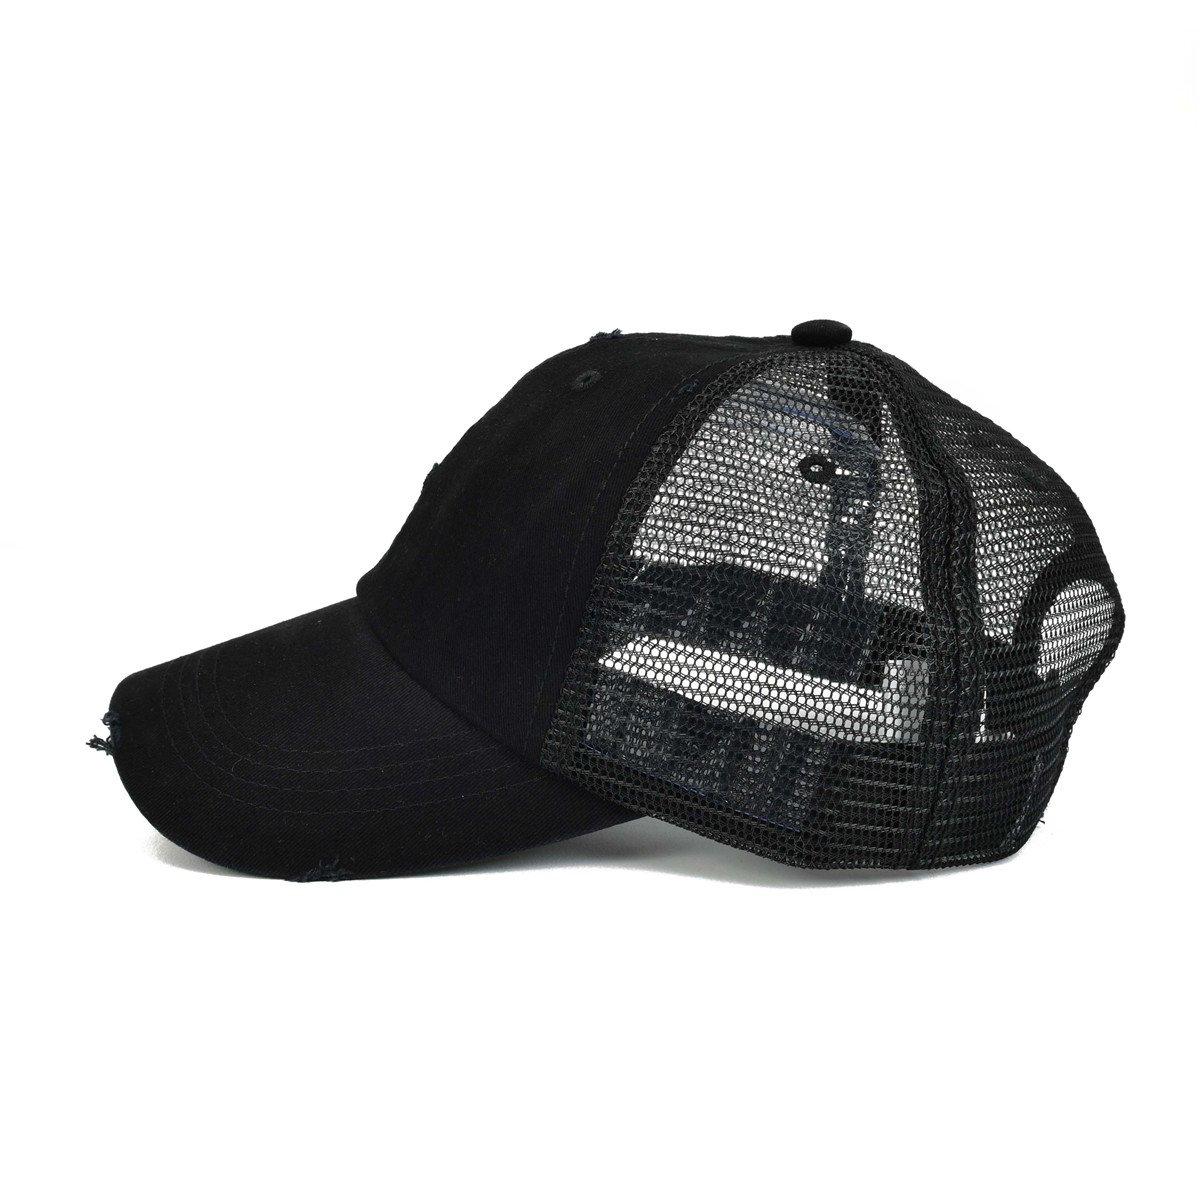 6612a1cbf2c VOBOOM Men s Vintage Washed Adjustable Mesh Trucker Baseball Cap Hat BQ020  (Black) at Amazon Men s Clothing store